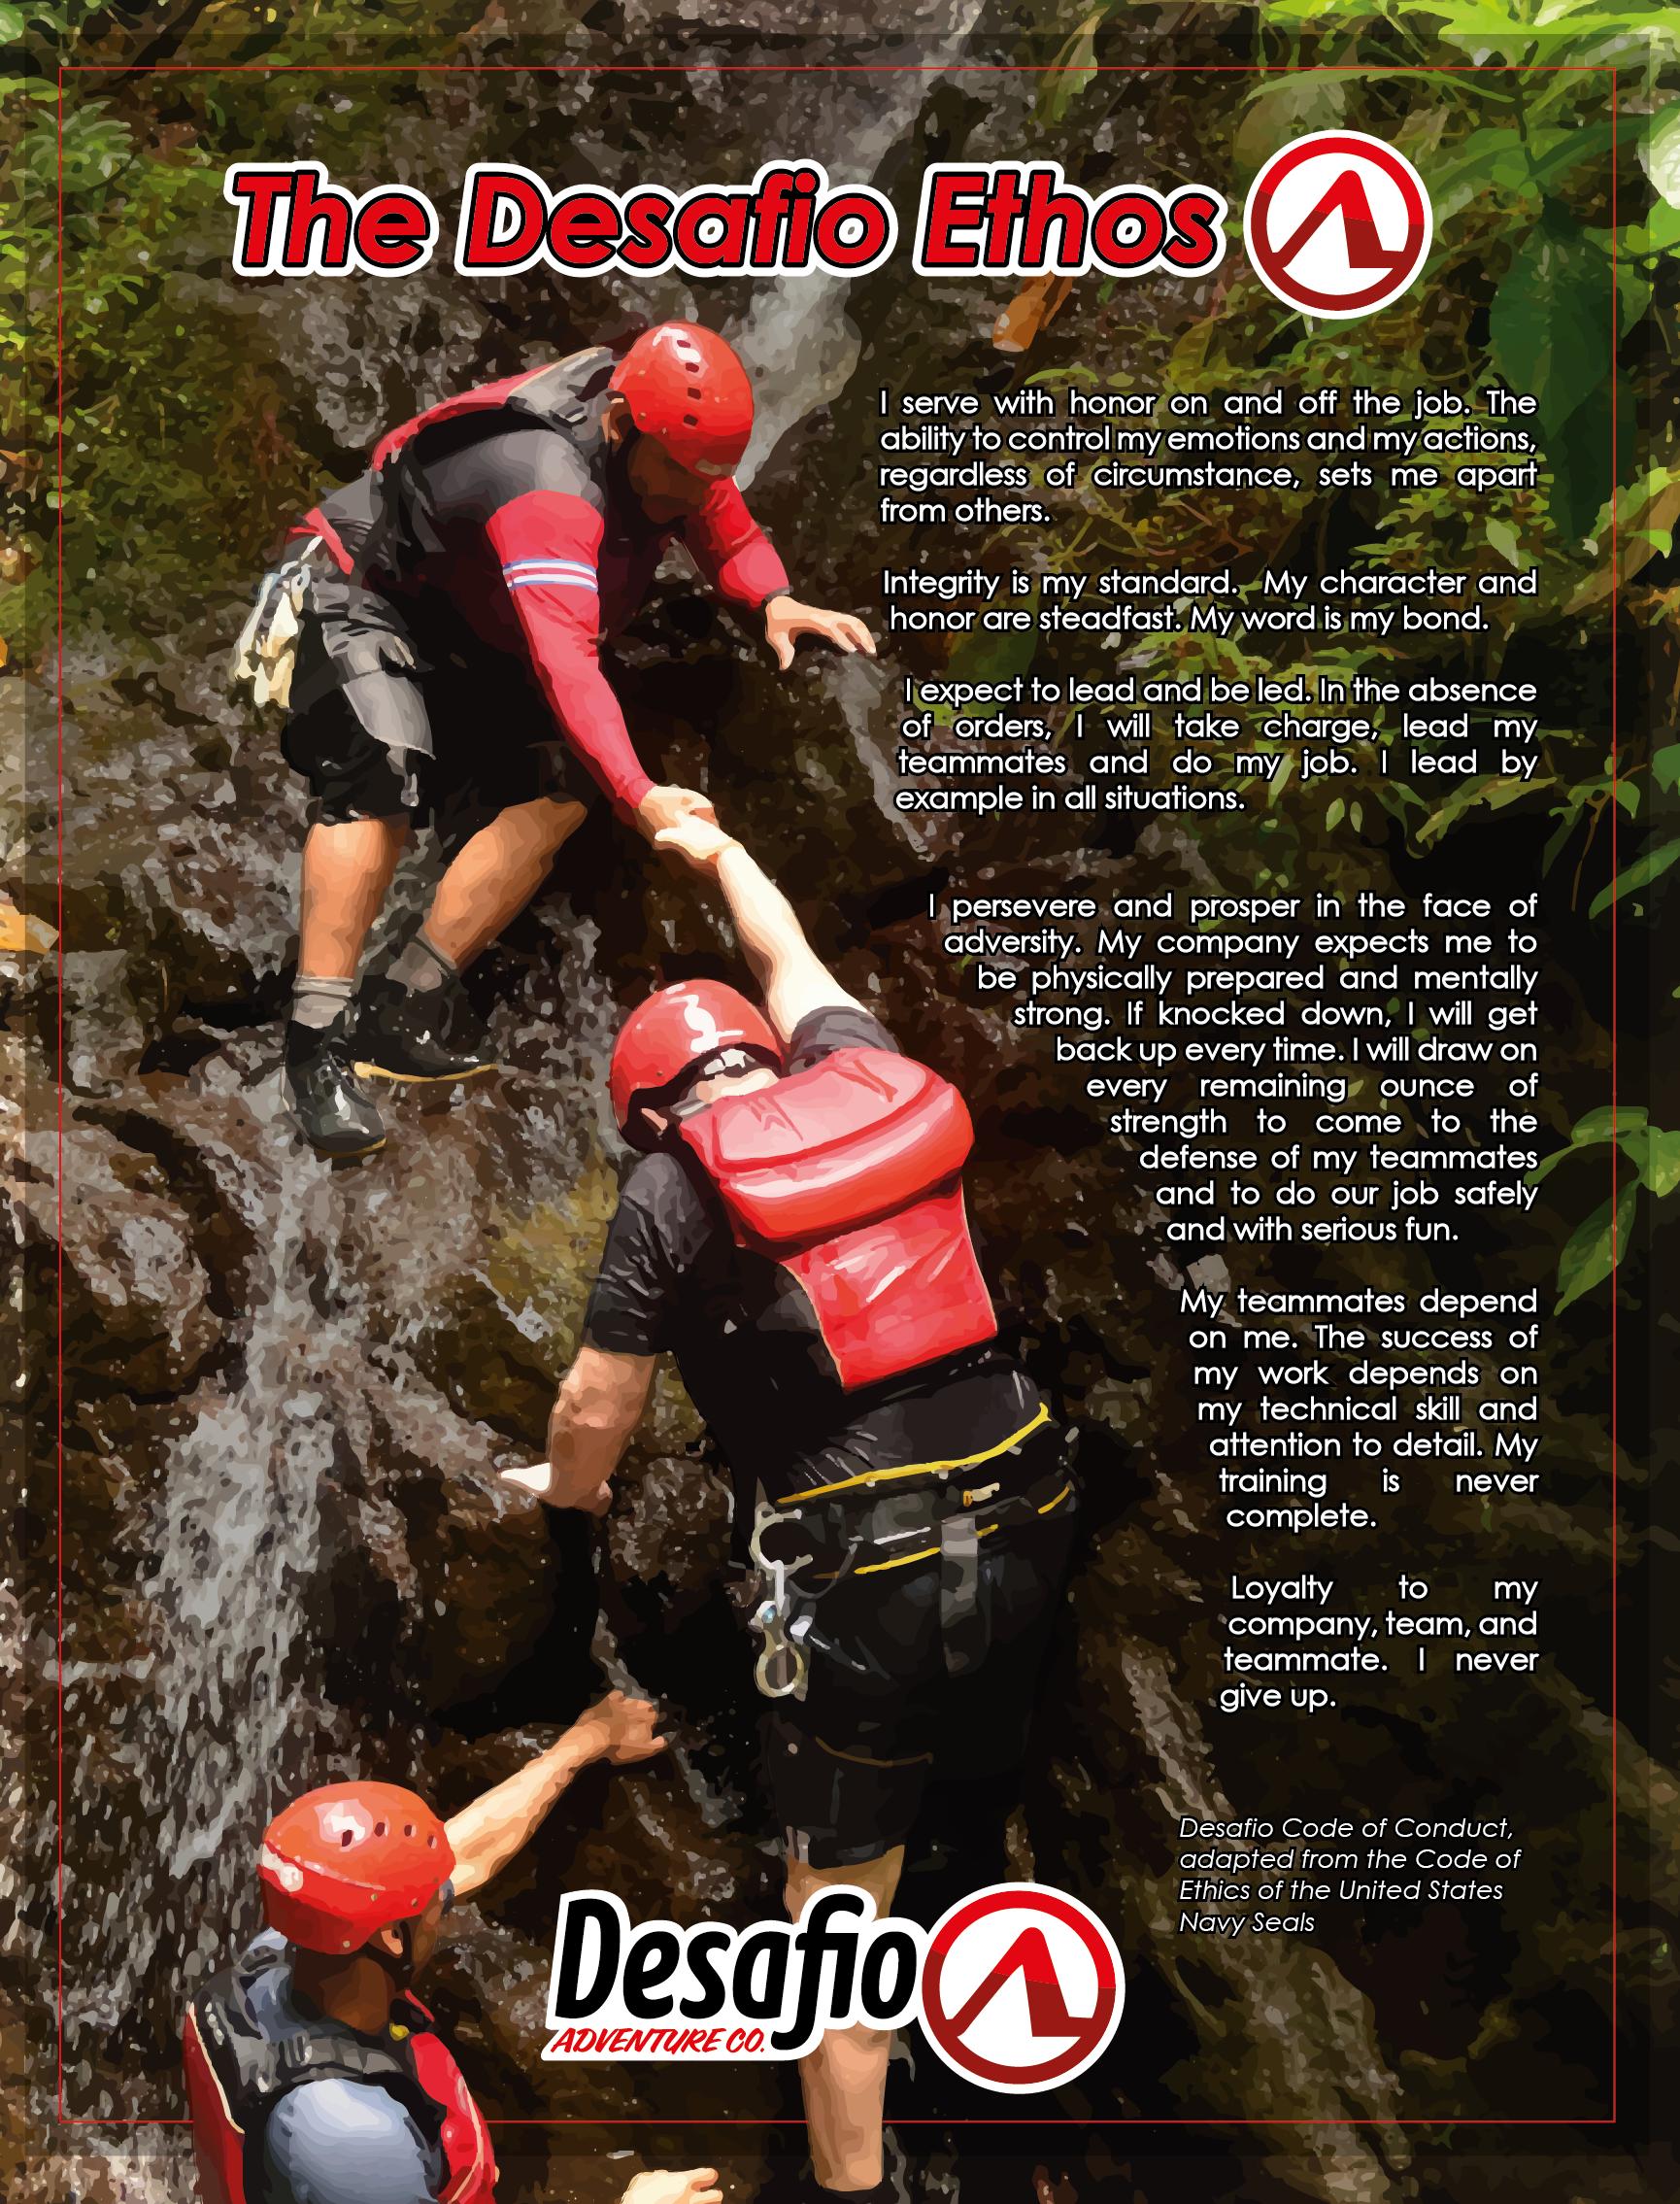 Desafio Costa Rica Awards